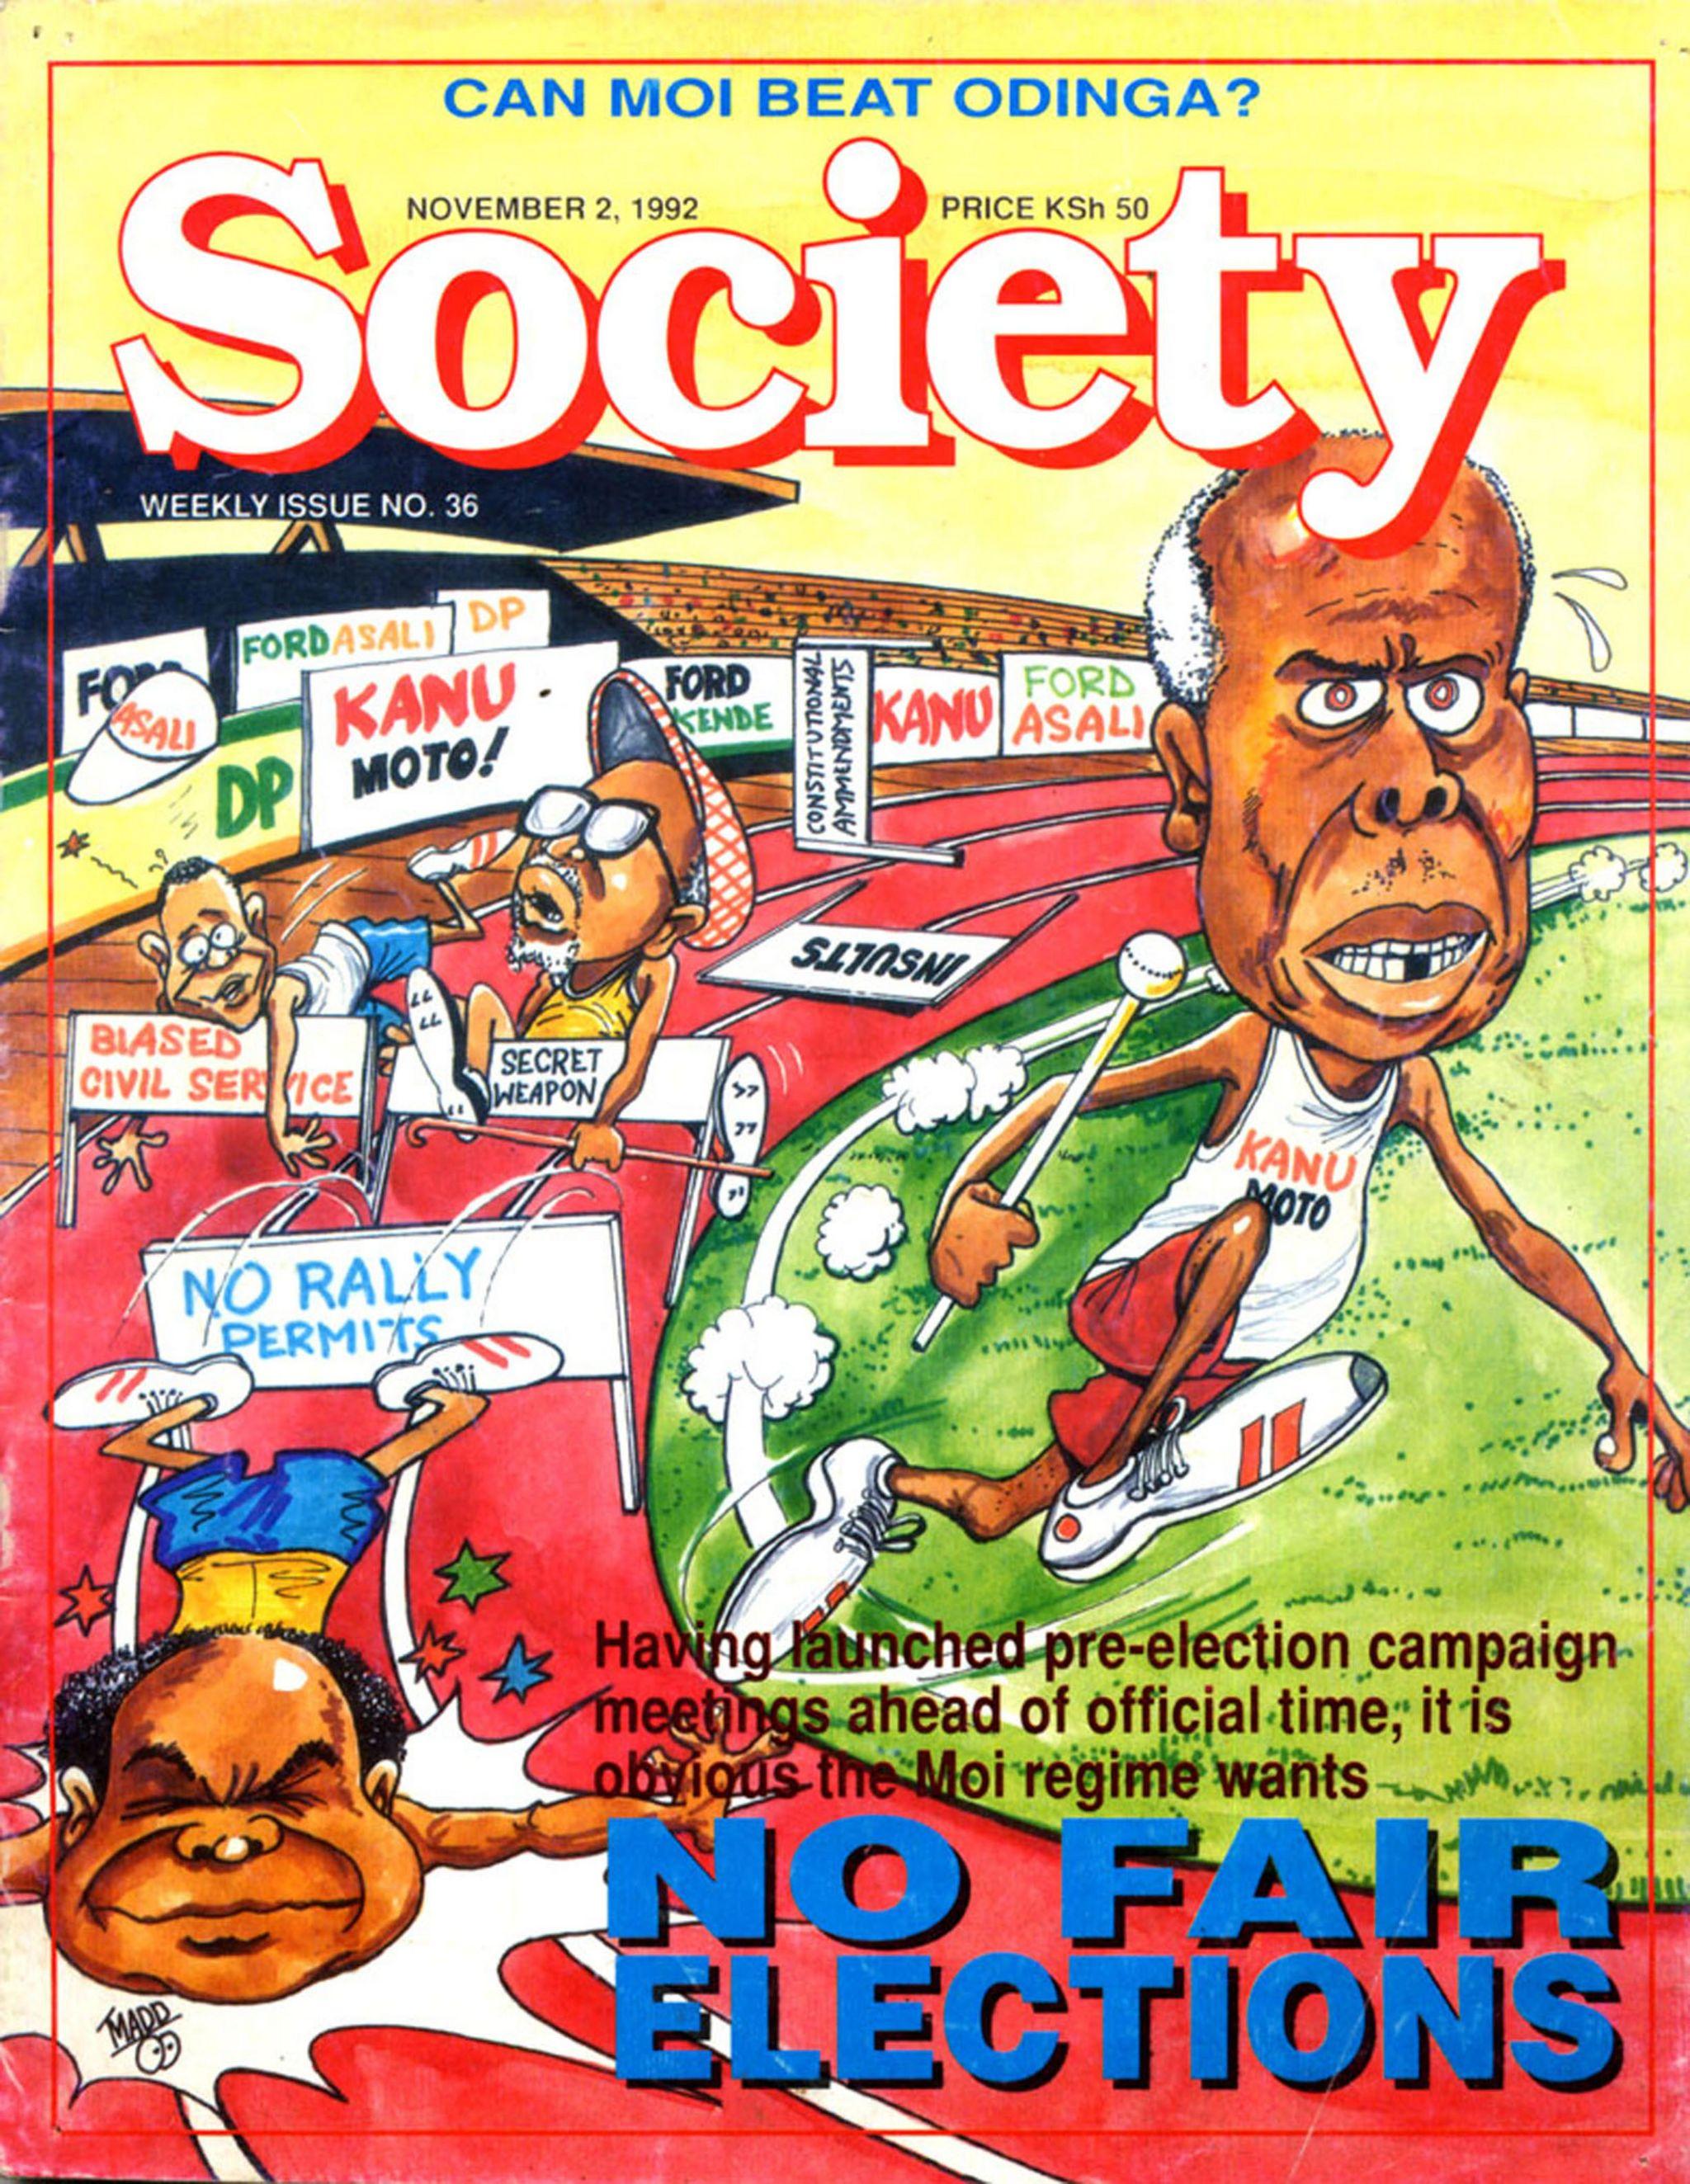 Magazine cover with a satirical cartoon